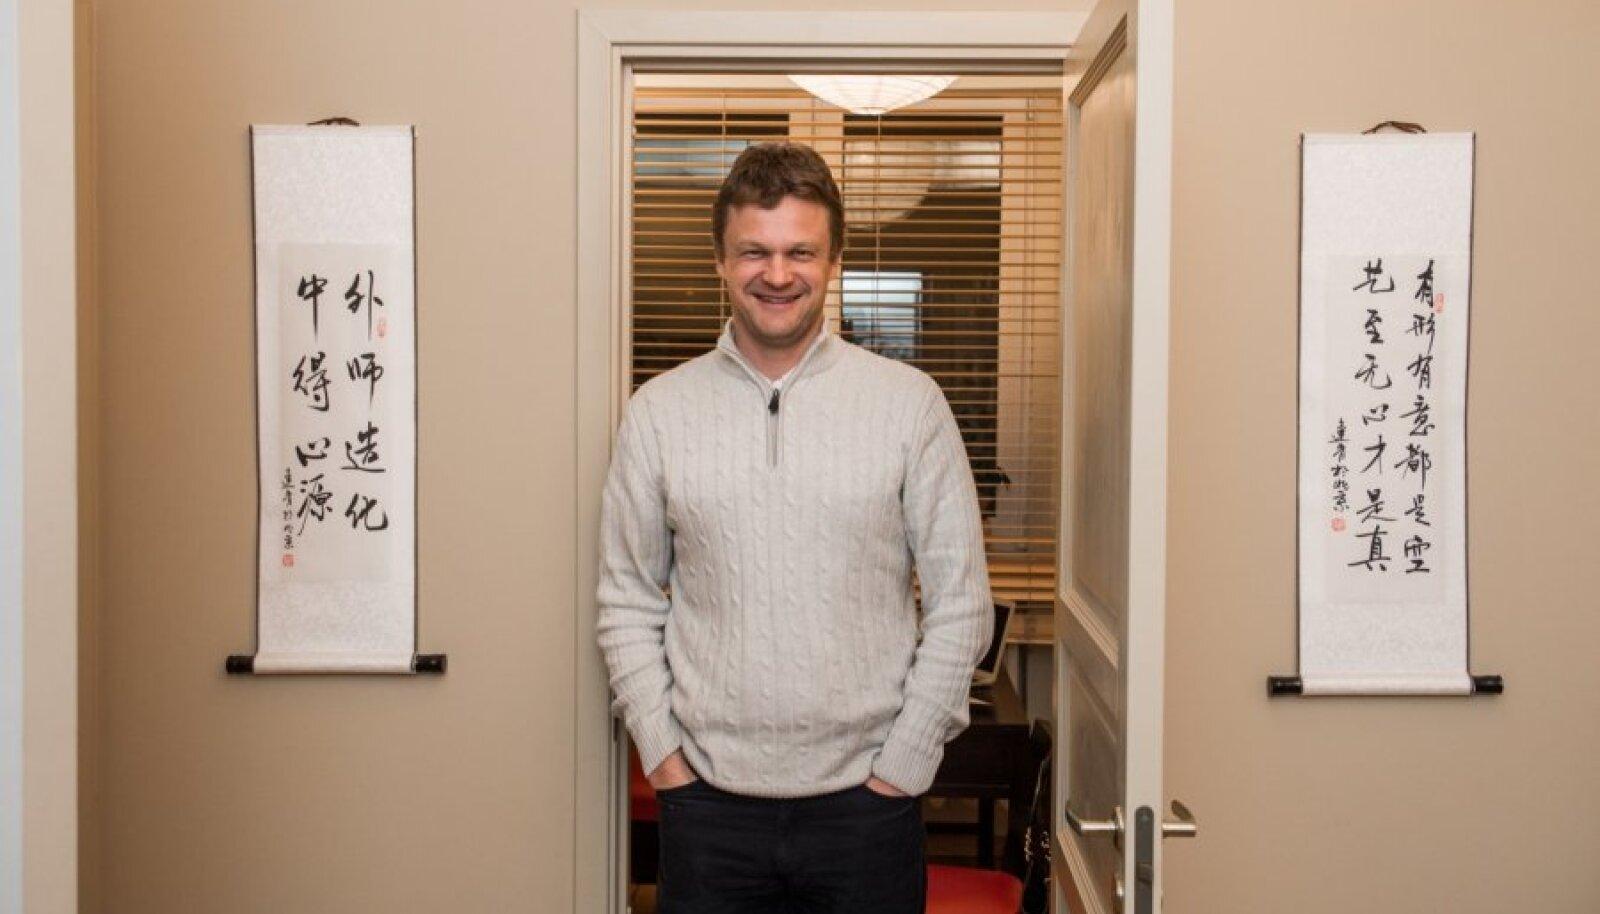 Rene Bürkland, Hiina meditsiin